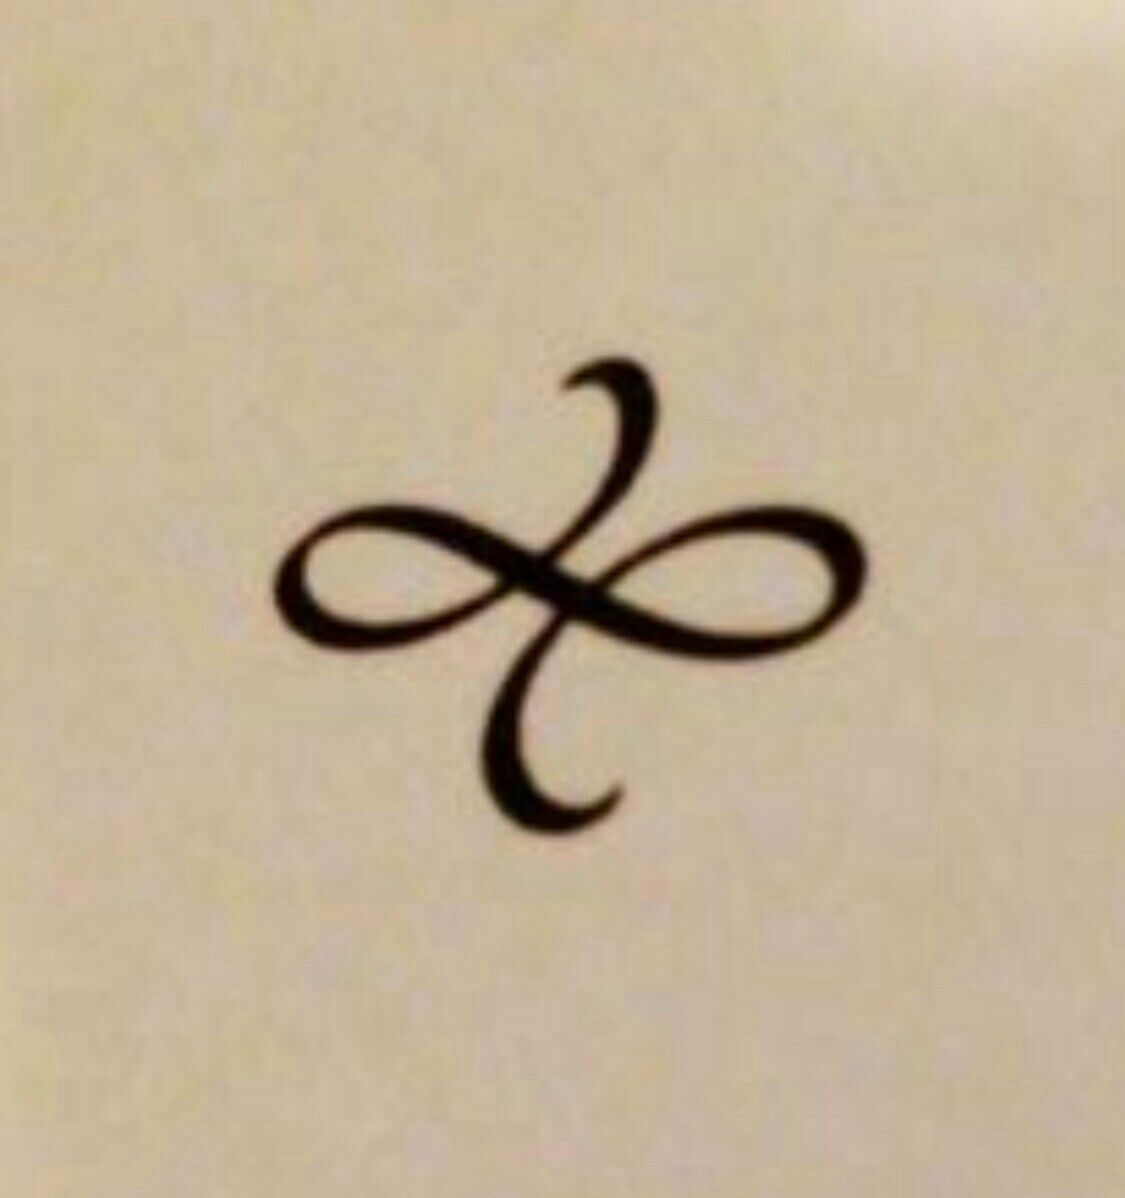 hight resolution of celtic symbol for friendship